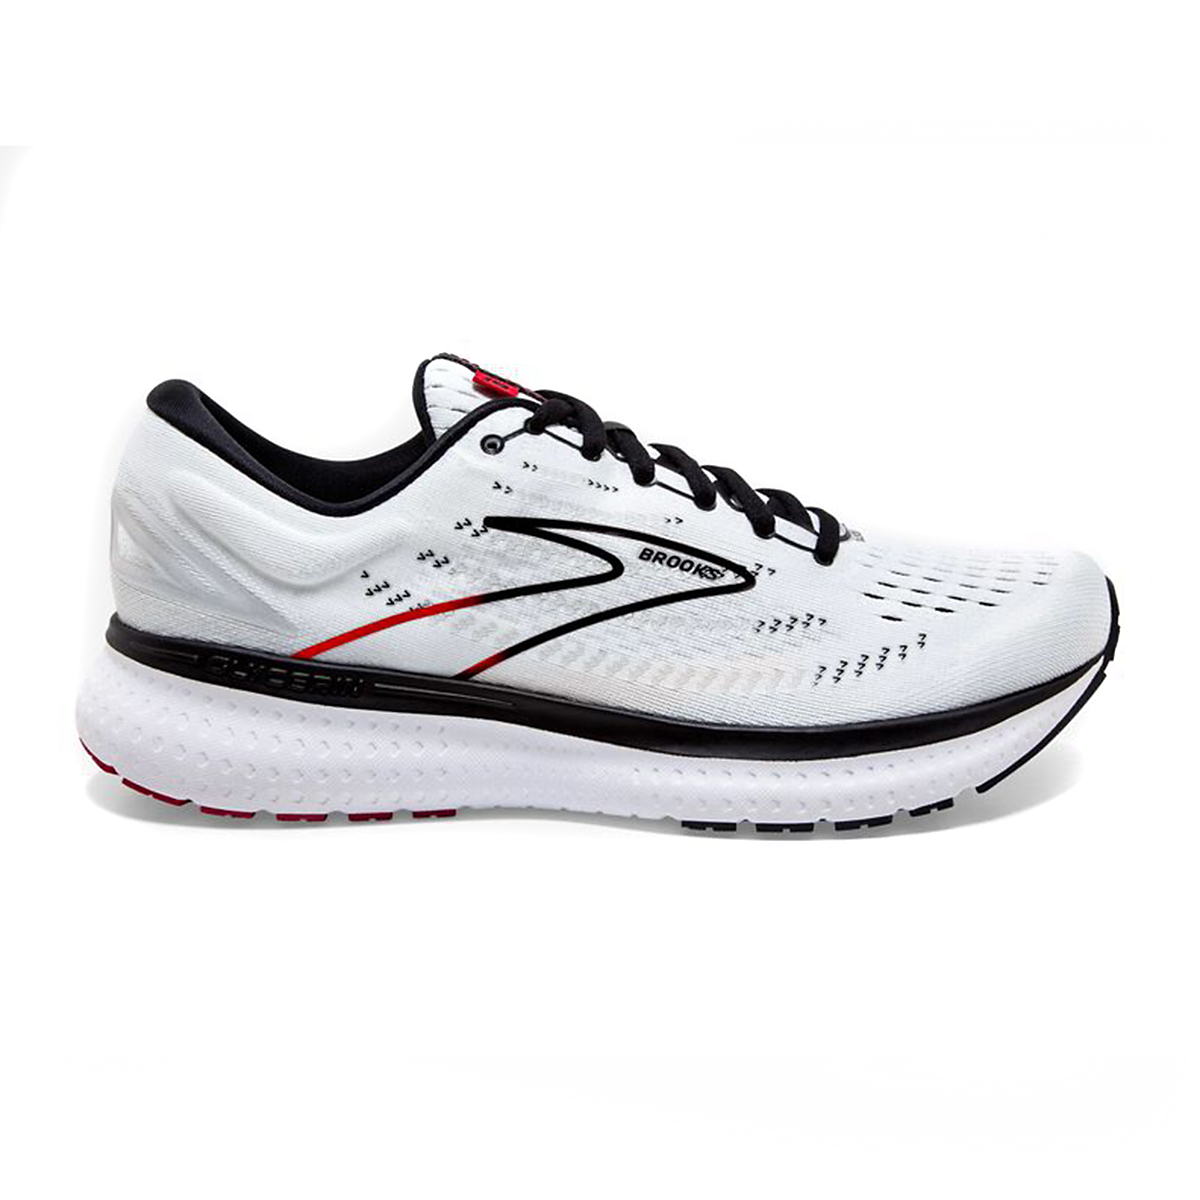 Men's Brooks Glycerin 19 Running Shoe - Color: White/Black/Red - Size: 7 - Width: Regular, White/Black/Red, large, image 1